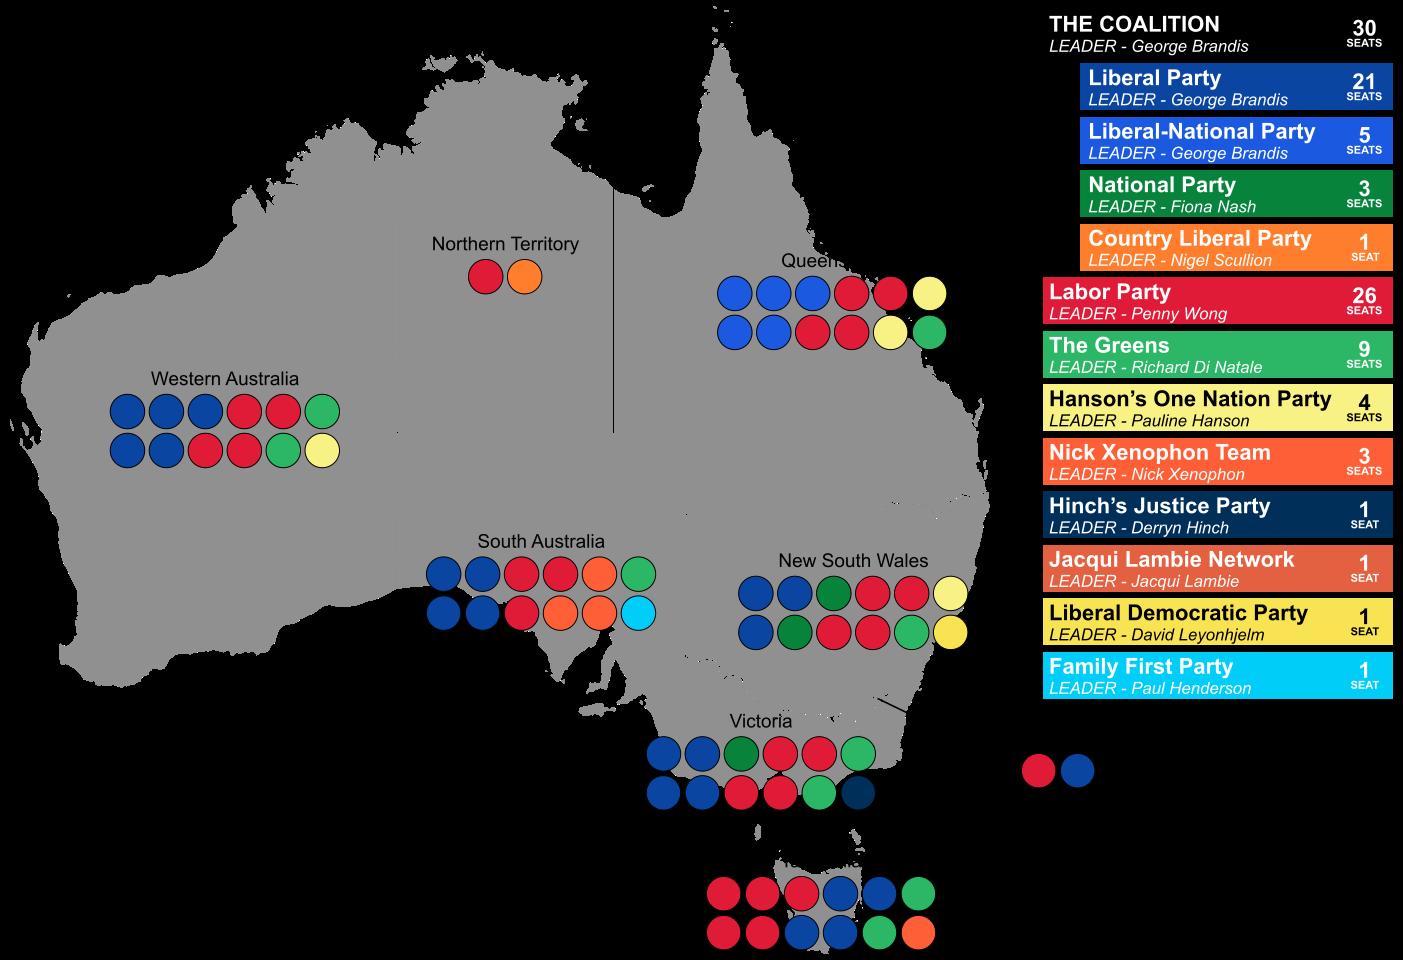 Pin on Maps of Australia / Australasia  Senate Map on 2008 senate map, new york senate elecction map, 2012 senate races map, 2010 ny districts map, 2015 senate map, ca gop map, democrat population map, election map, 2012 battleground map,